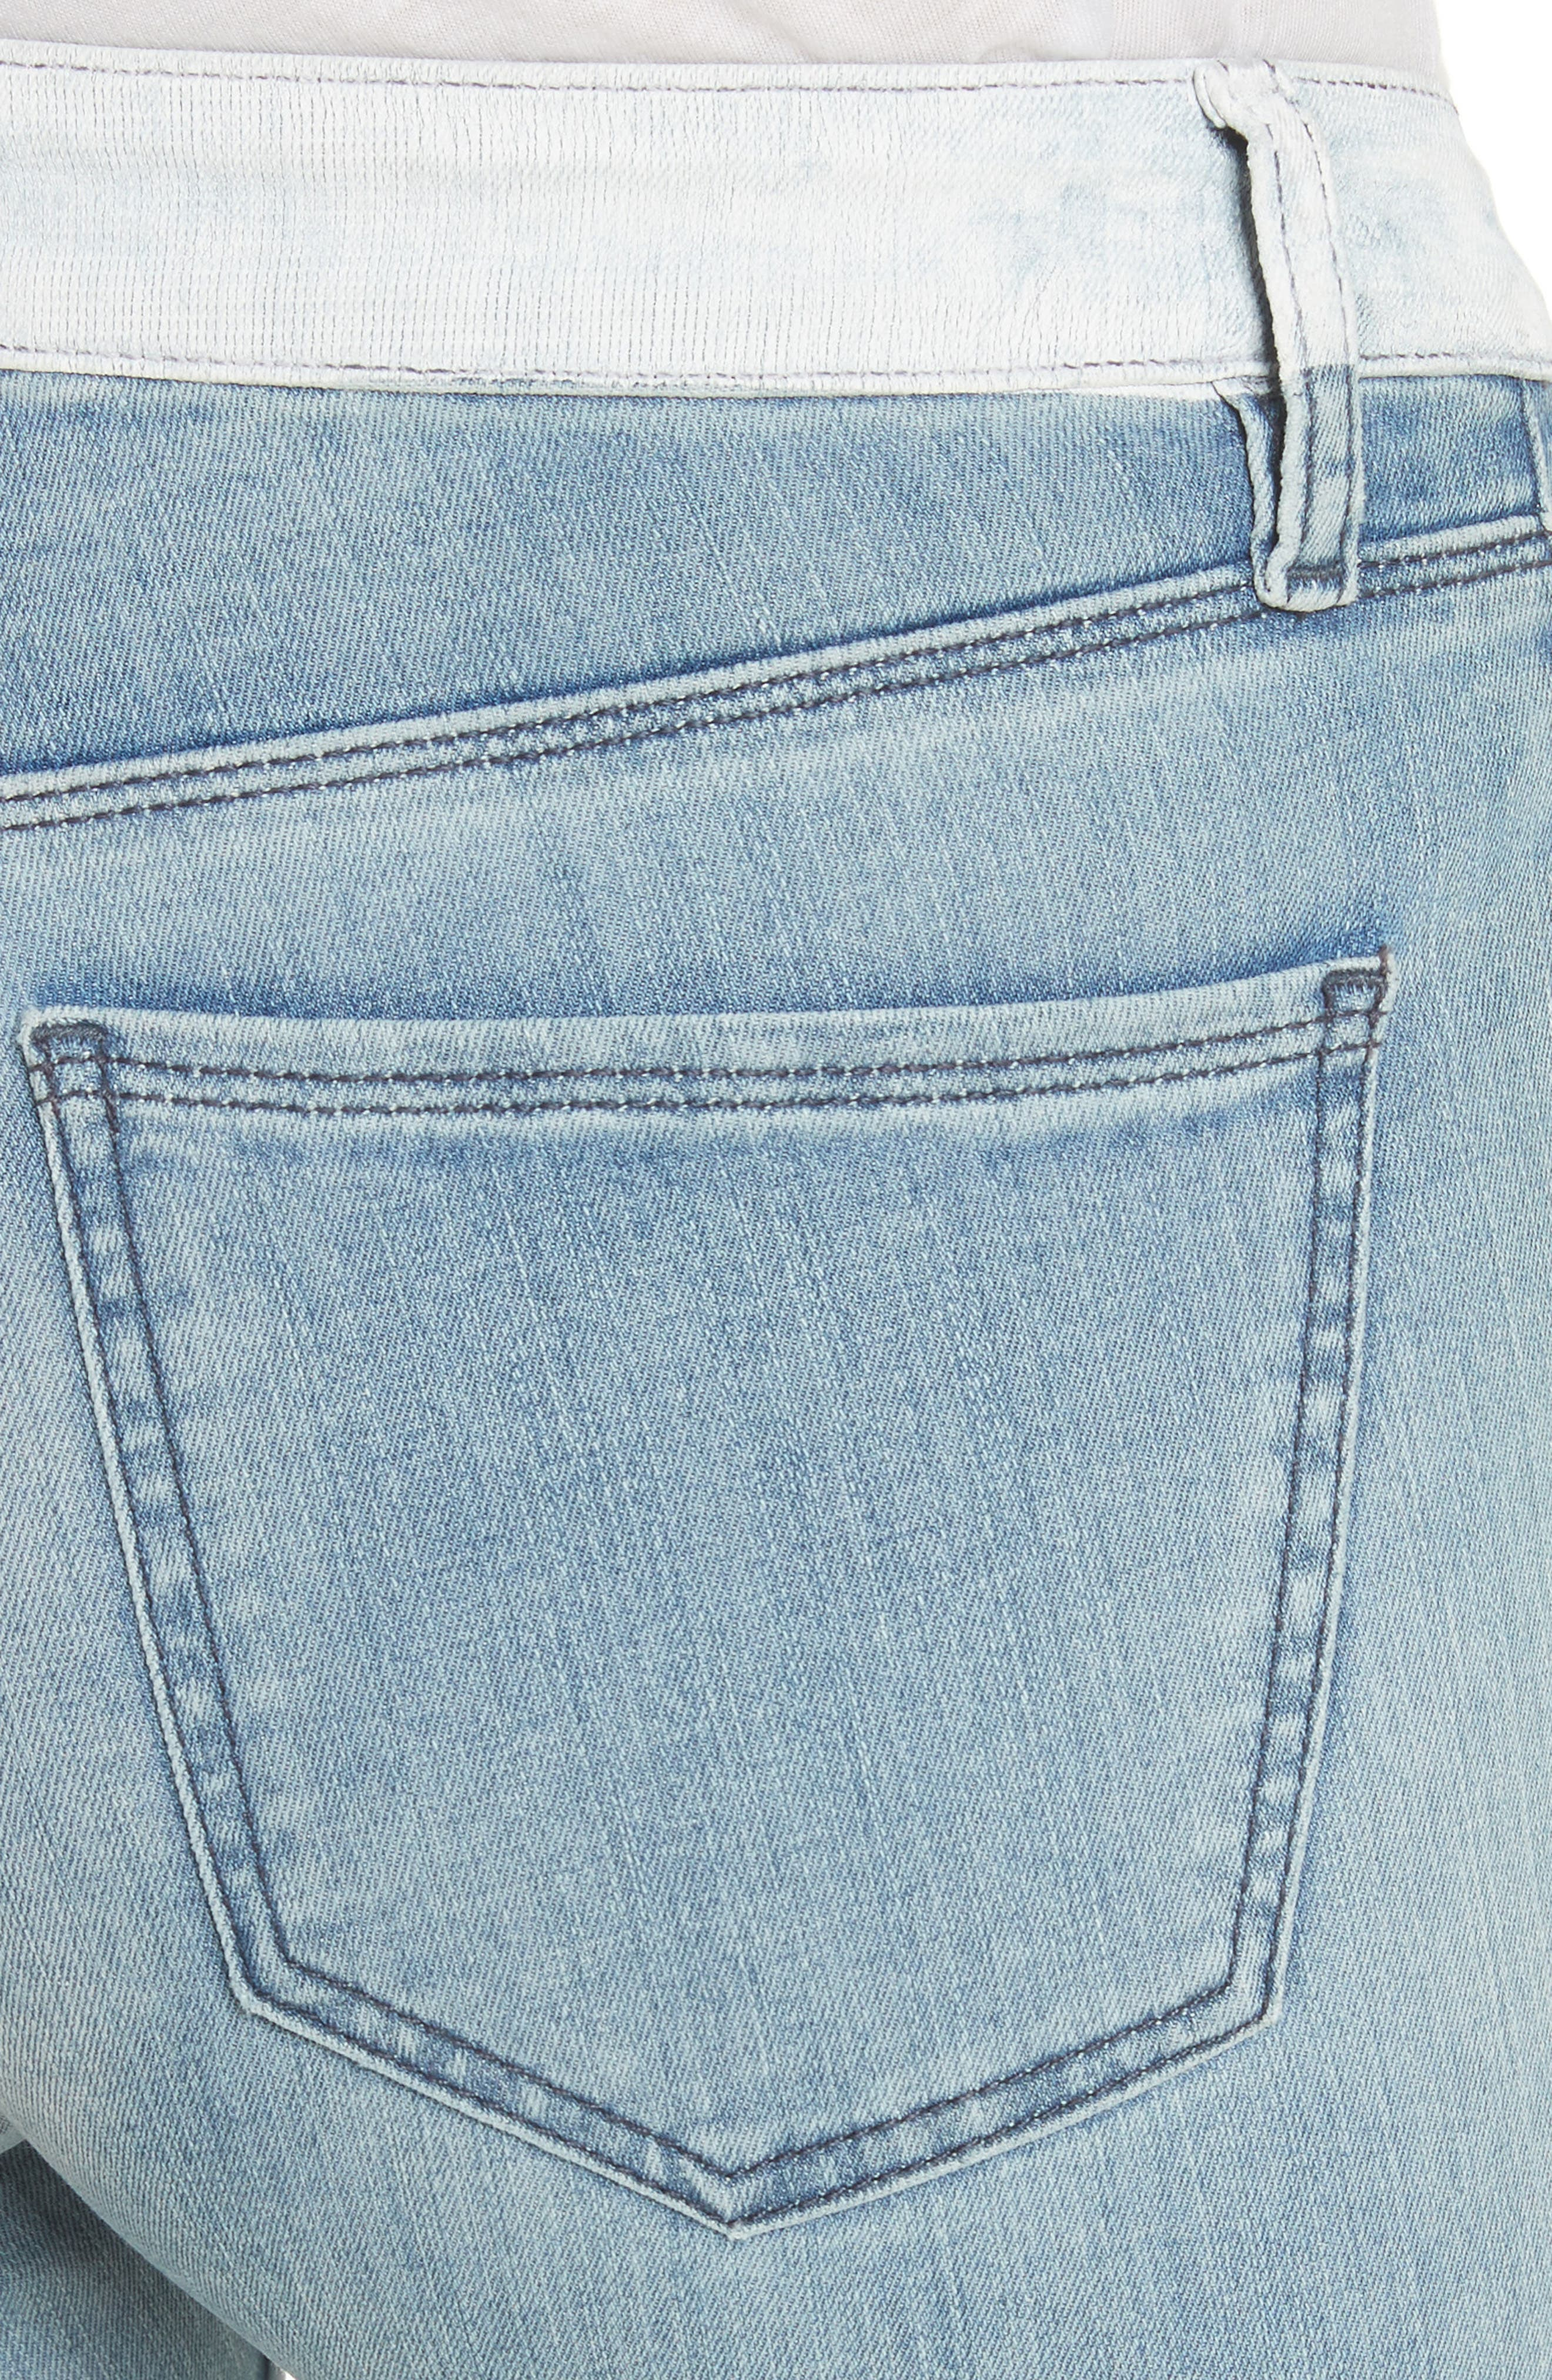 Emma Coated Skinny Jeans,                             Alternate thumbnail 4, color,                             Running Blue